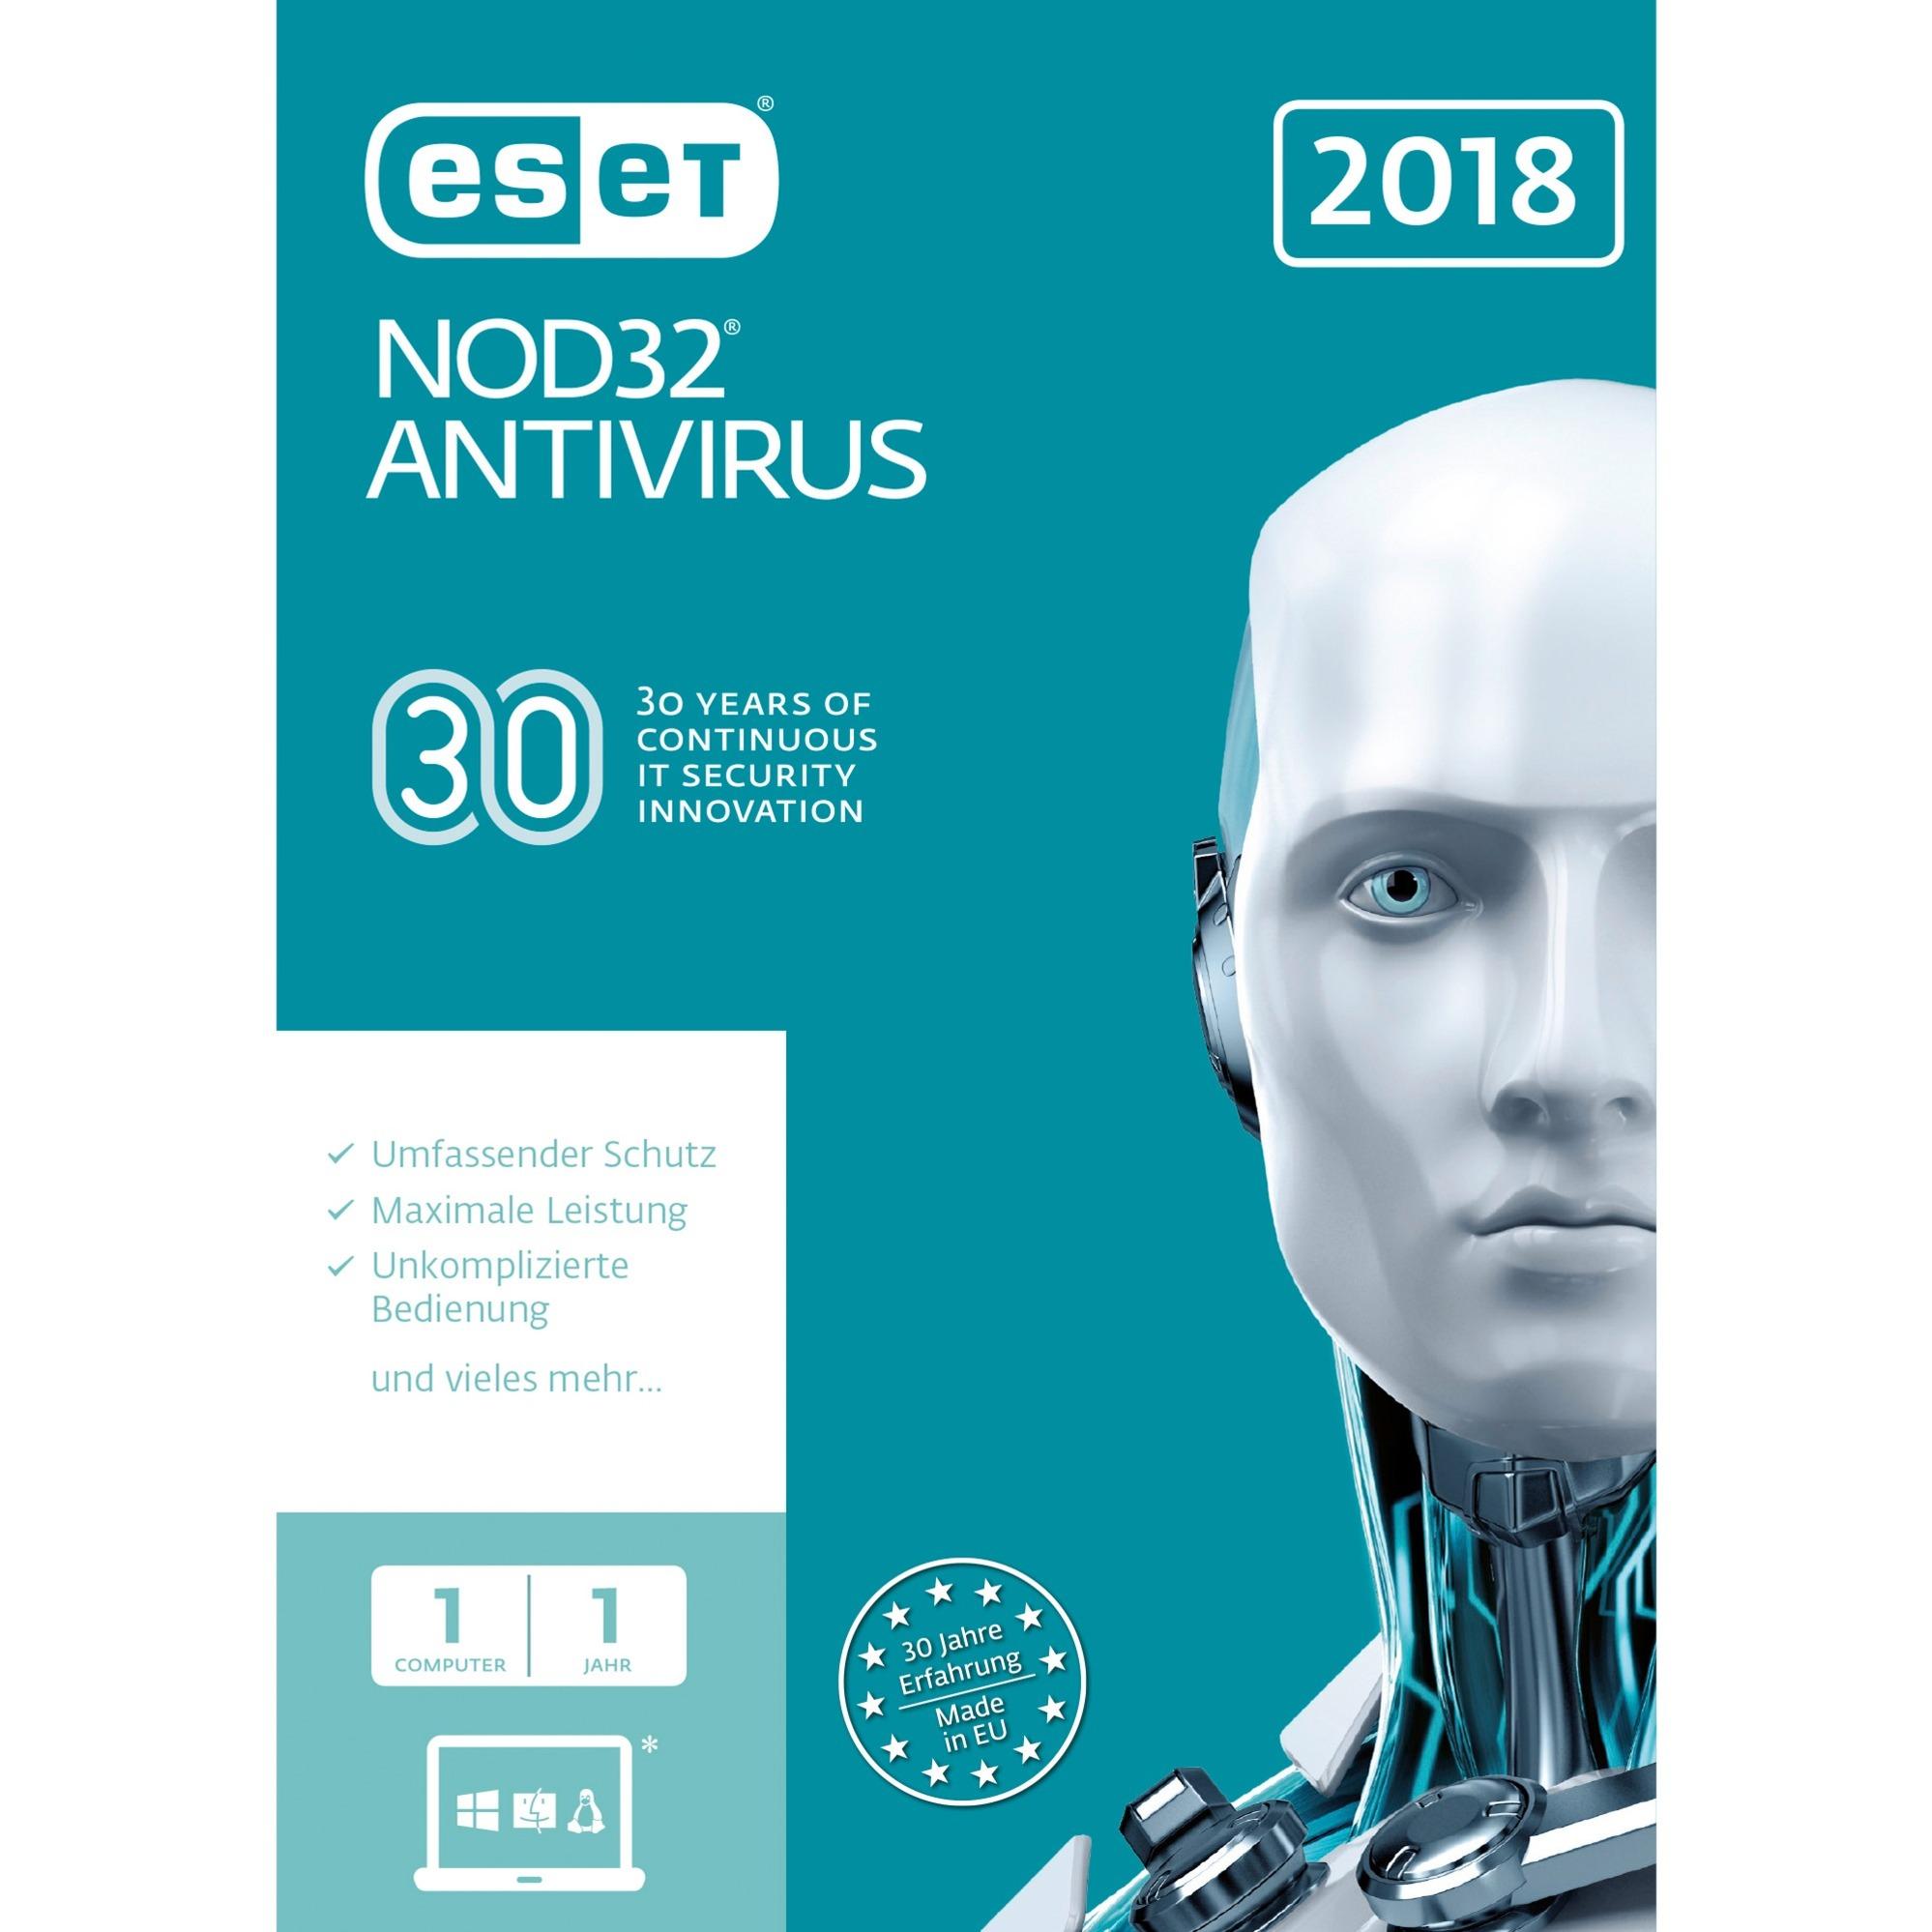 NOD32 Antivirus 2018 1usuario(s) Base license Alemán, Software